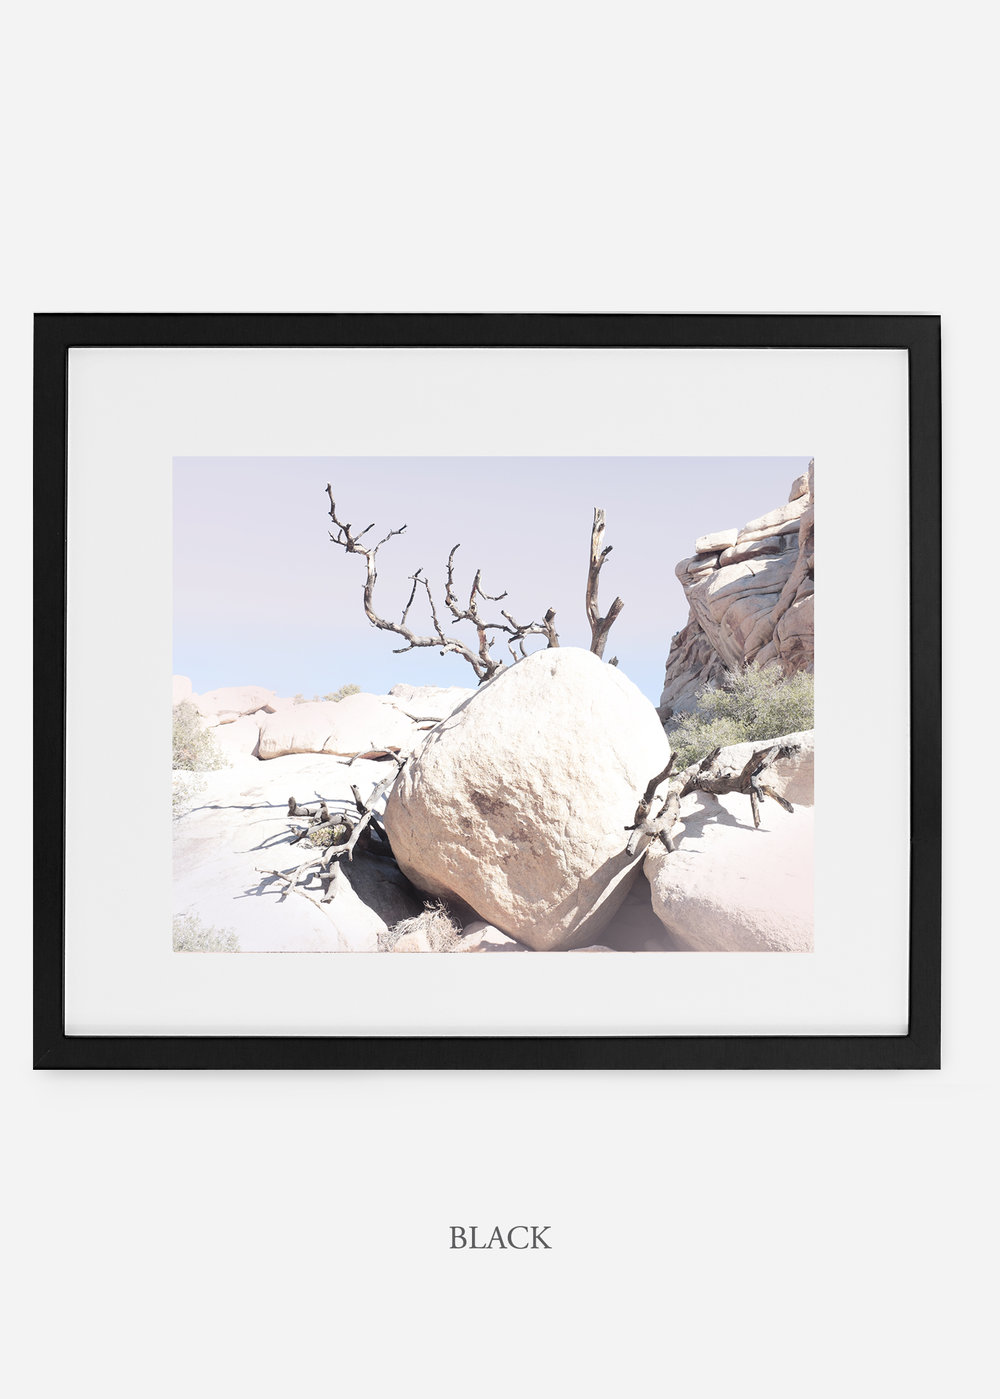 WilderCalifornia_black_JoshuaTree_No.17_interiordesign_prints_art.jpg